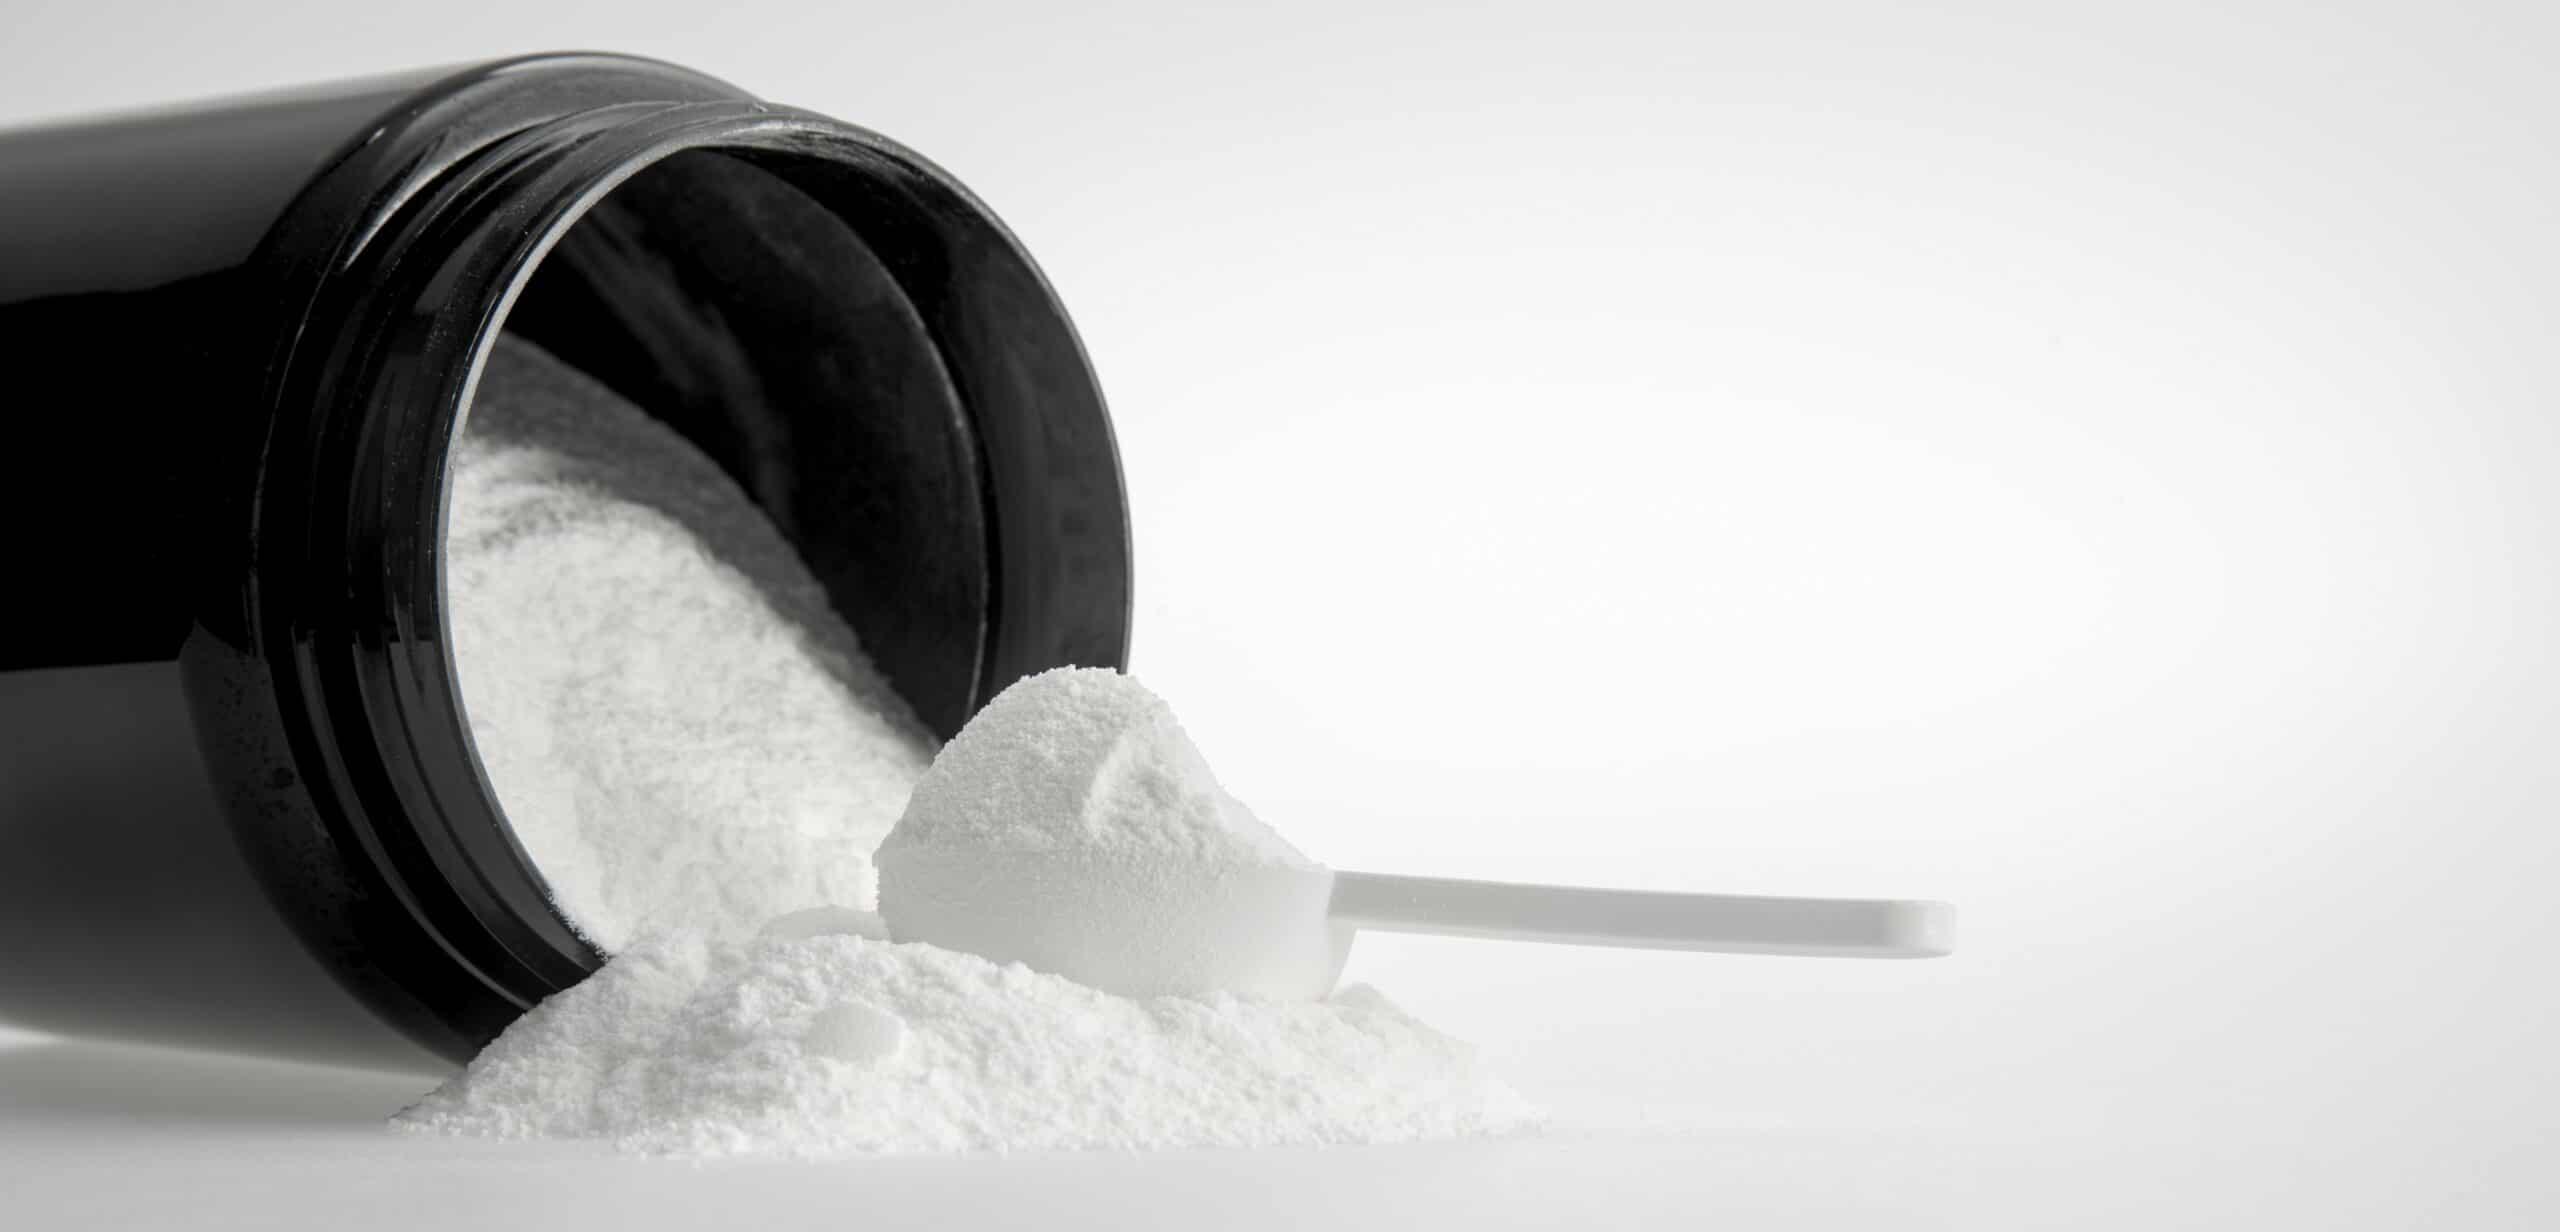 proteine siero del latte in polvere